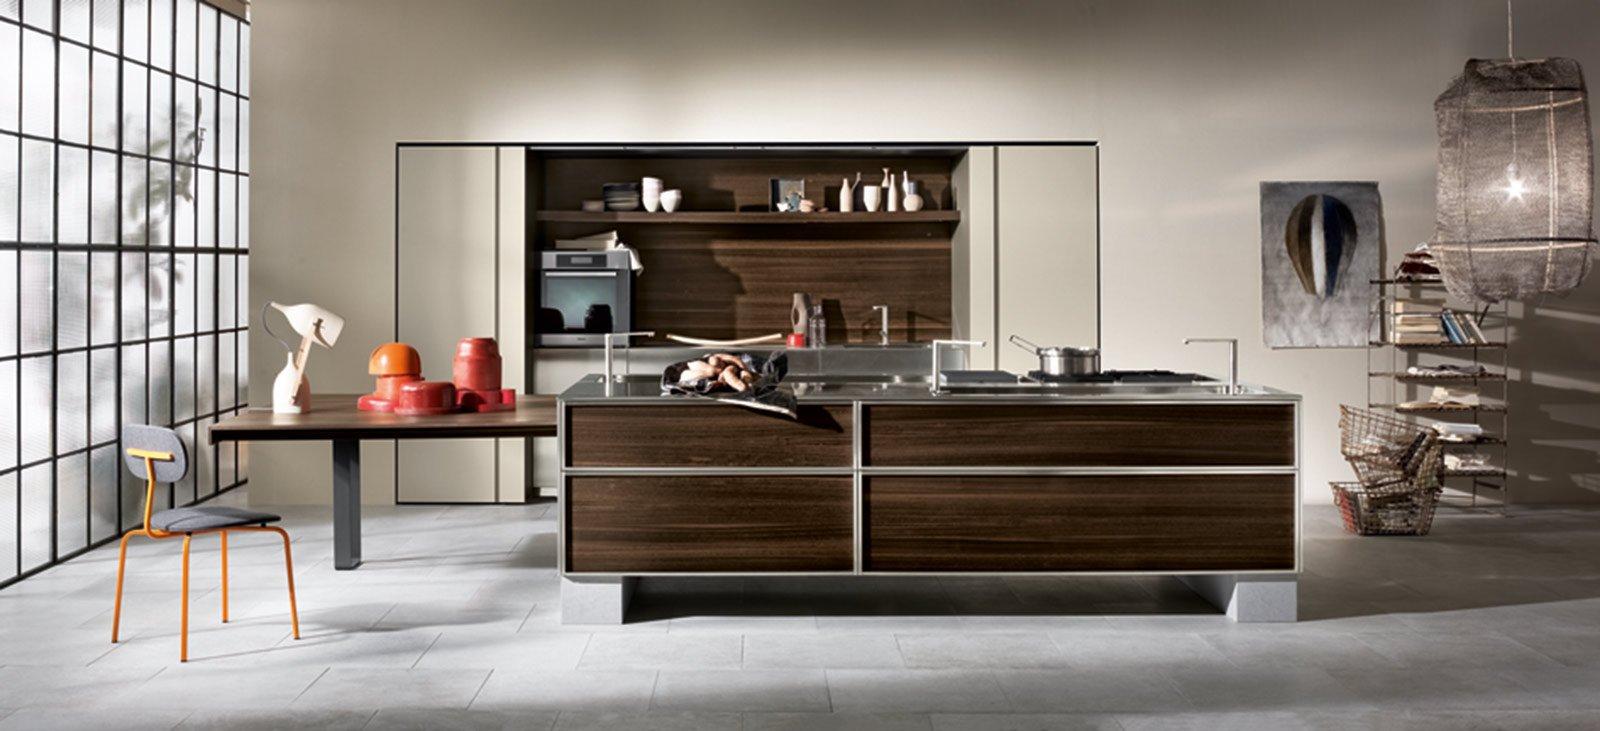 Cucine moderne in legno cose di casa - Cucine legno e acciaio ...